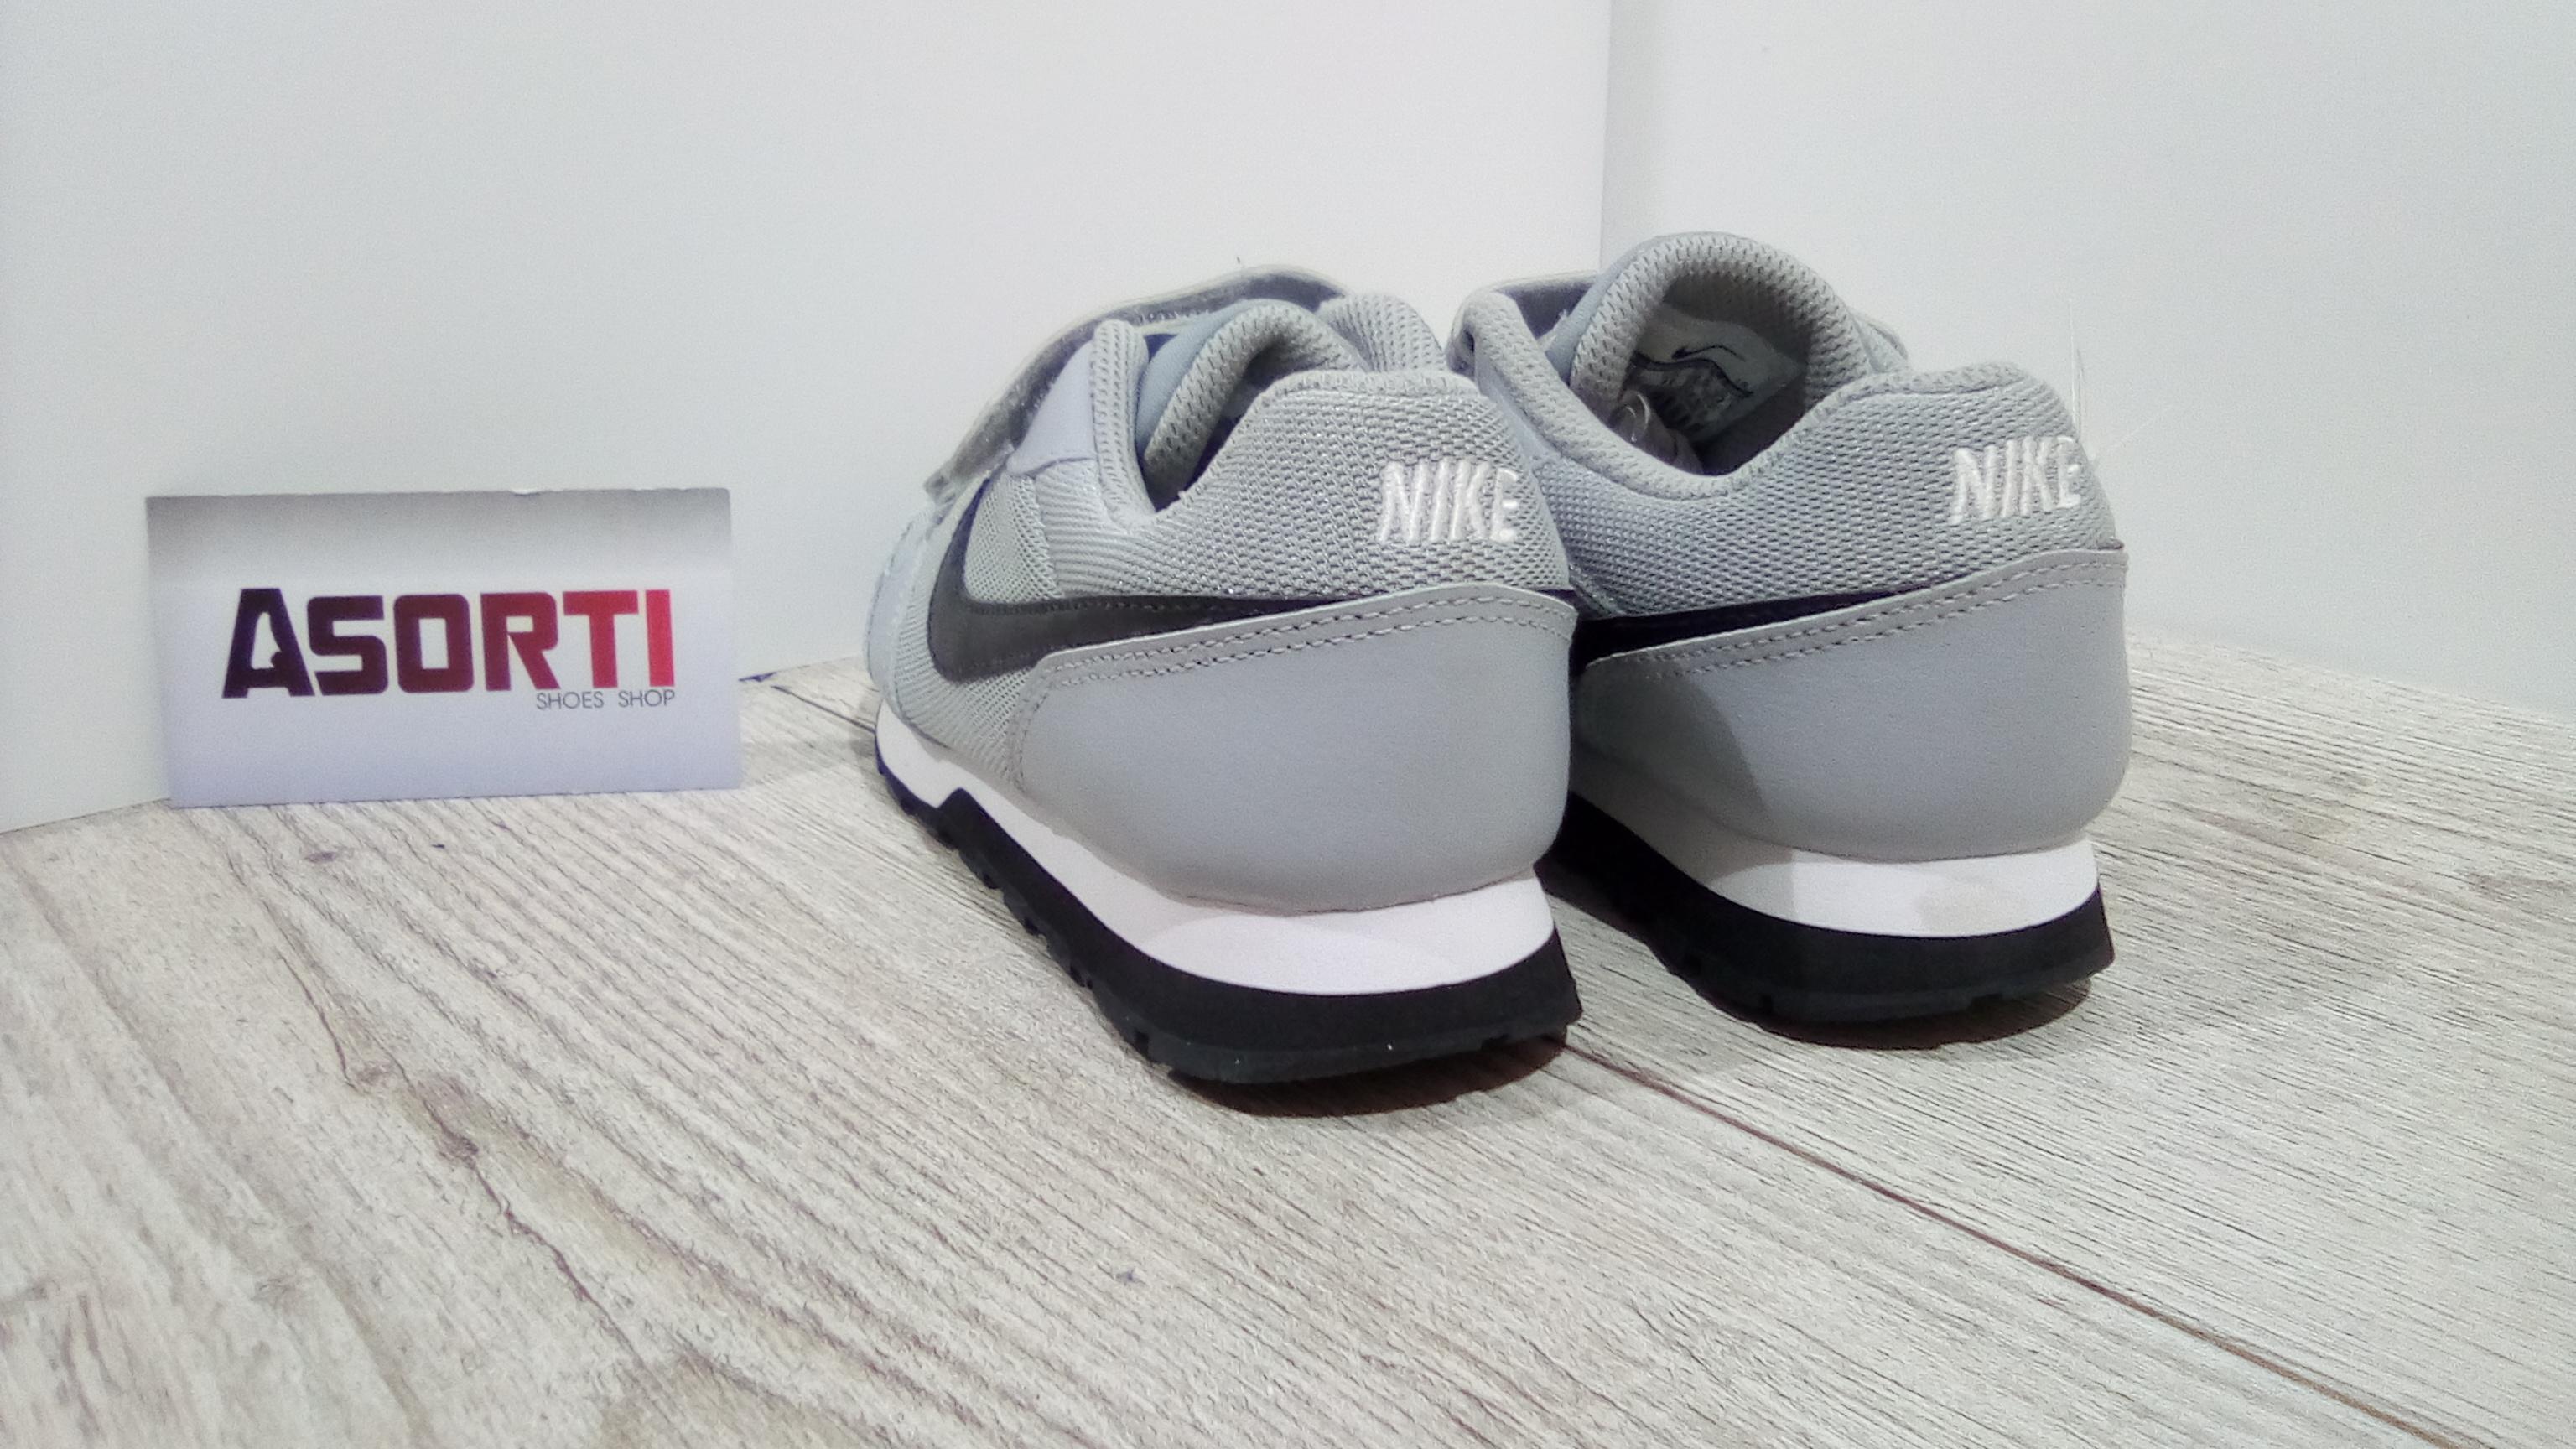 ae9a53465e4bc4 Дитячі кросівки Nike MD Runner 2 PSV (807317-003) сірі купити в ...